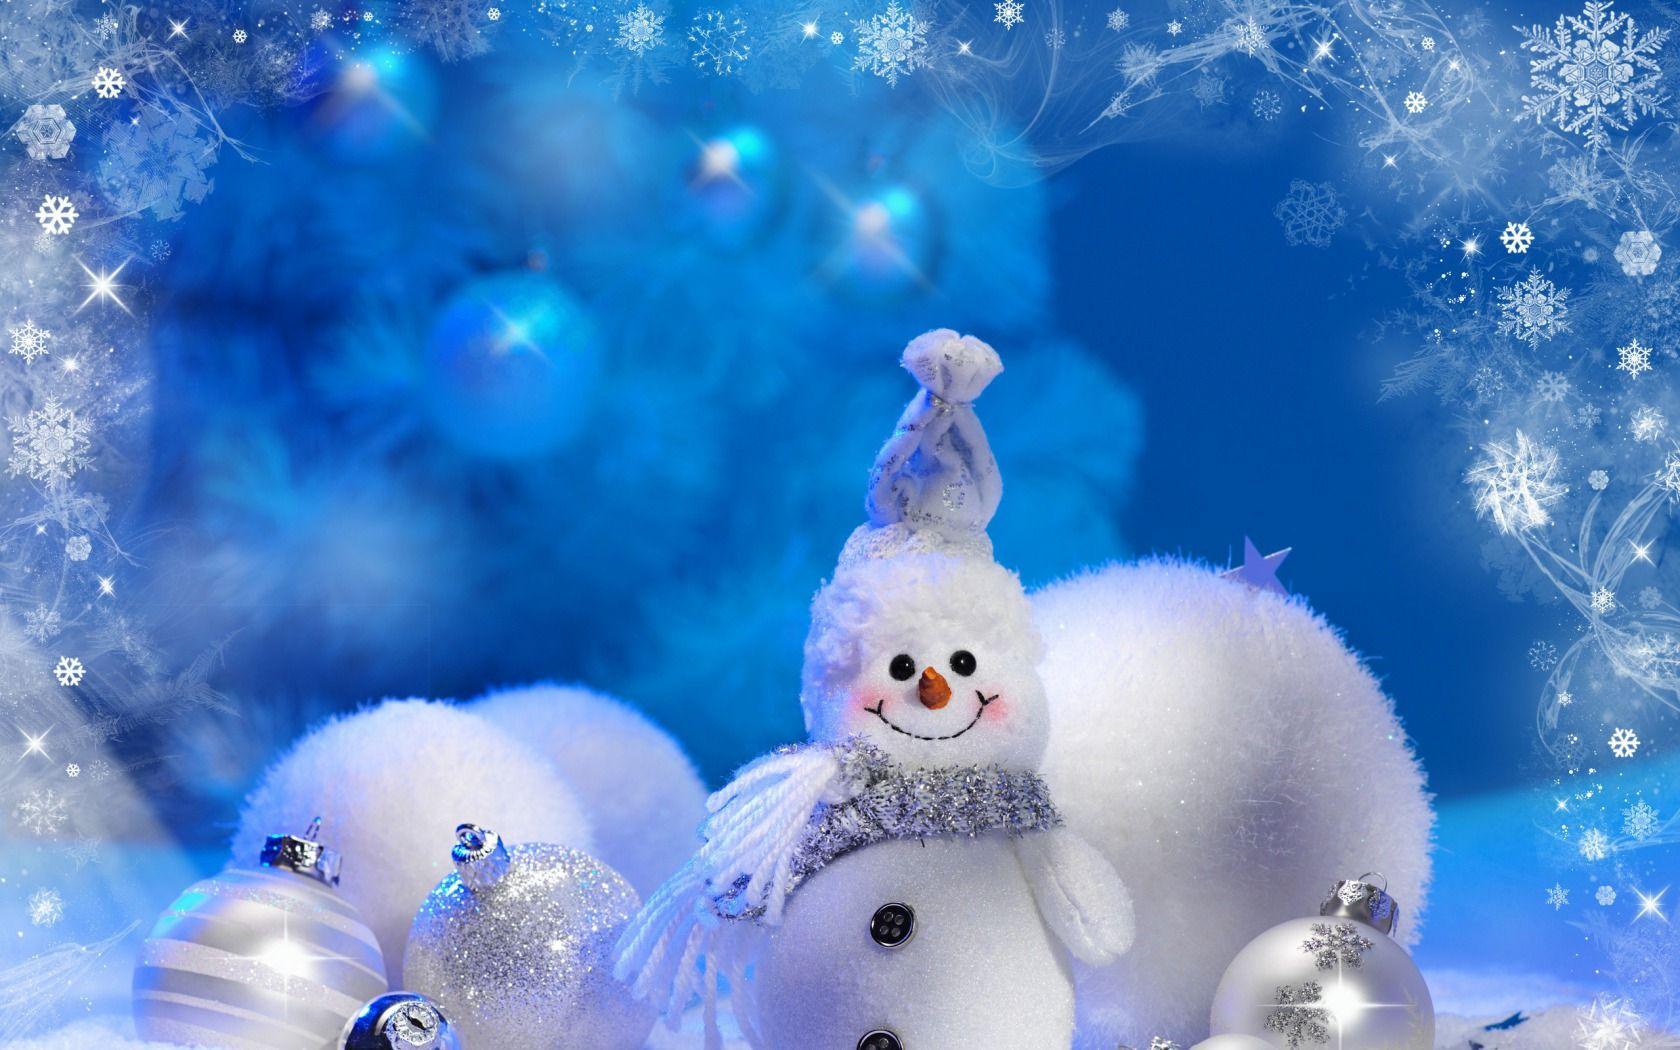 snowman - Elmer Fudd Blue Christmas